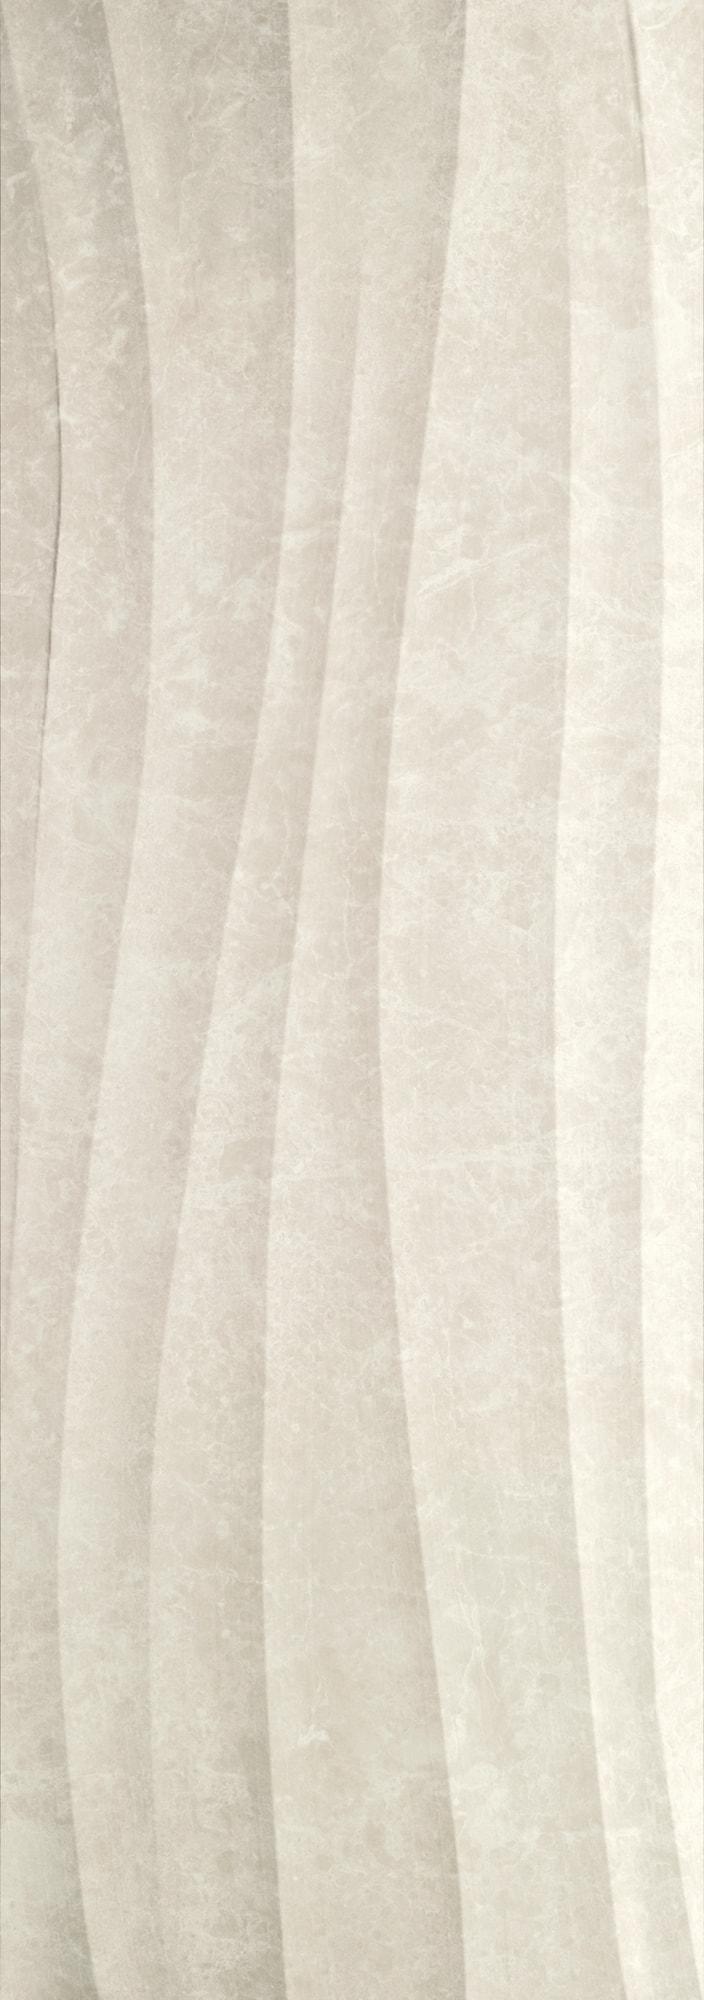 Marble Shape Light Grey